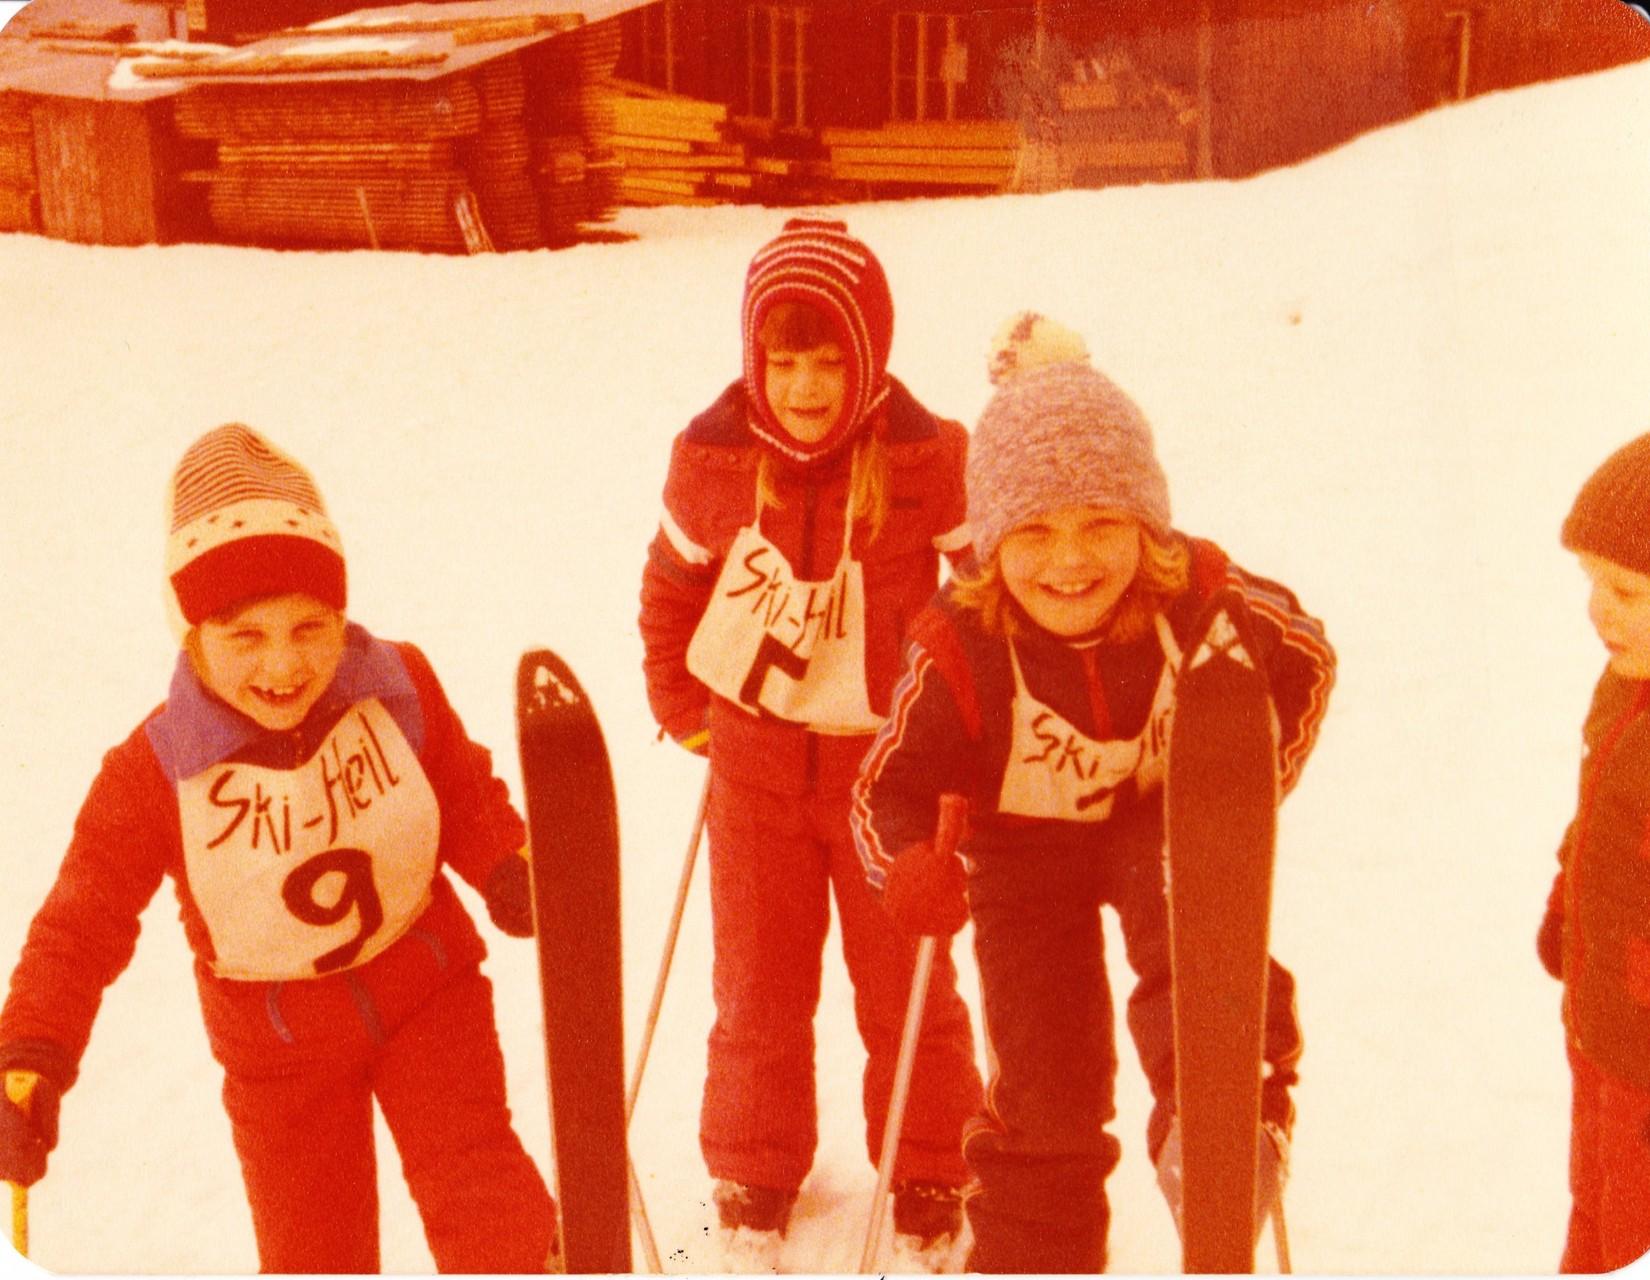 Schülerskirennen 1978, v.l.n.r. Patrizia Balmer, Sonja Hornung, Ursula Rüeggsegger